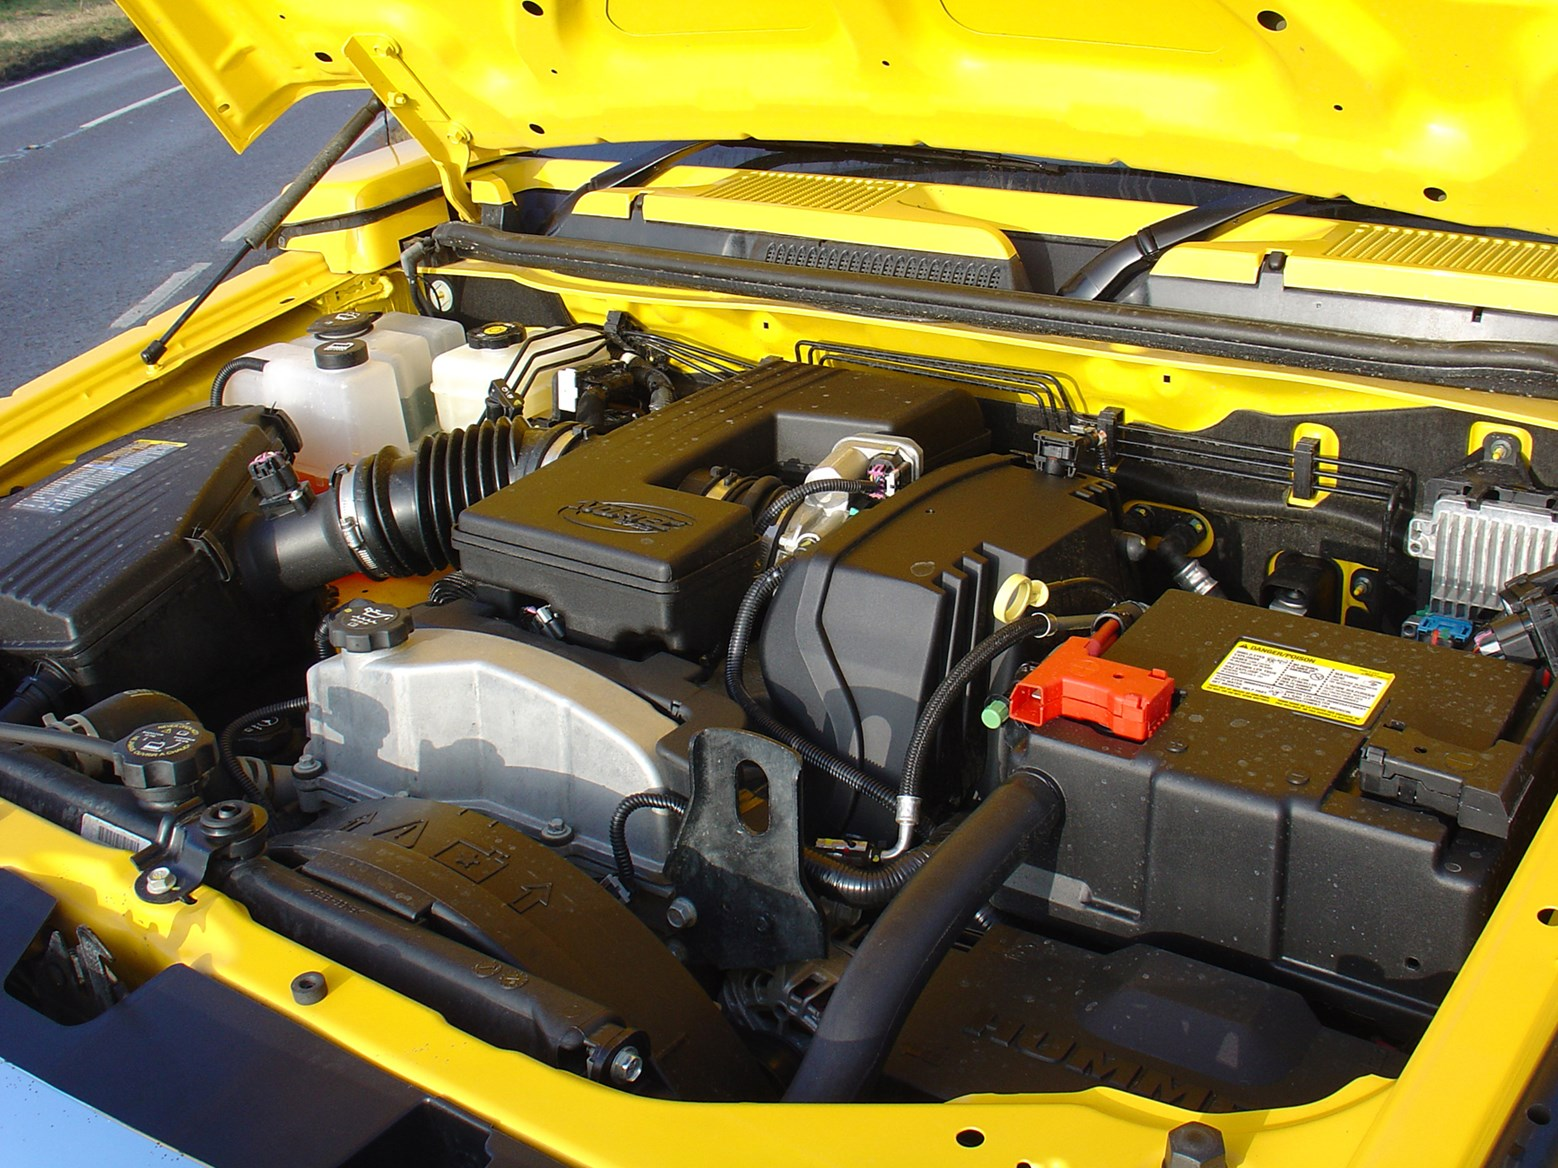 Used Hummer H3 Estate (2007 - 2010) Engines   Parkers